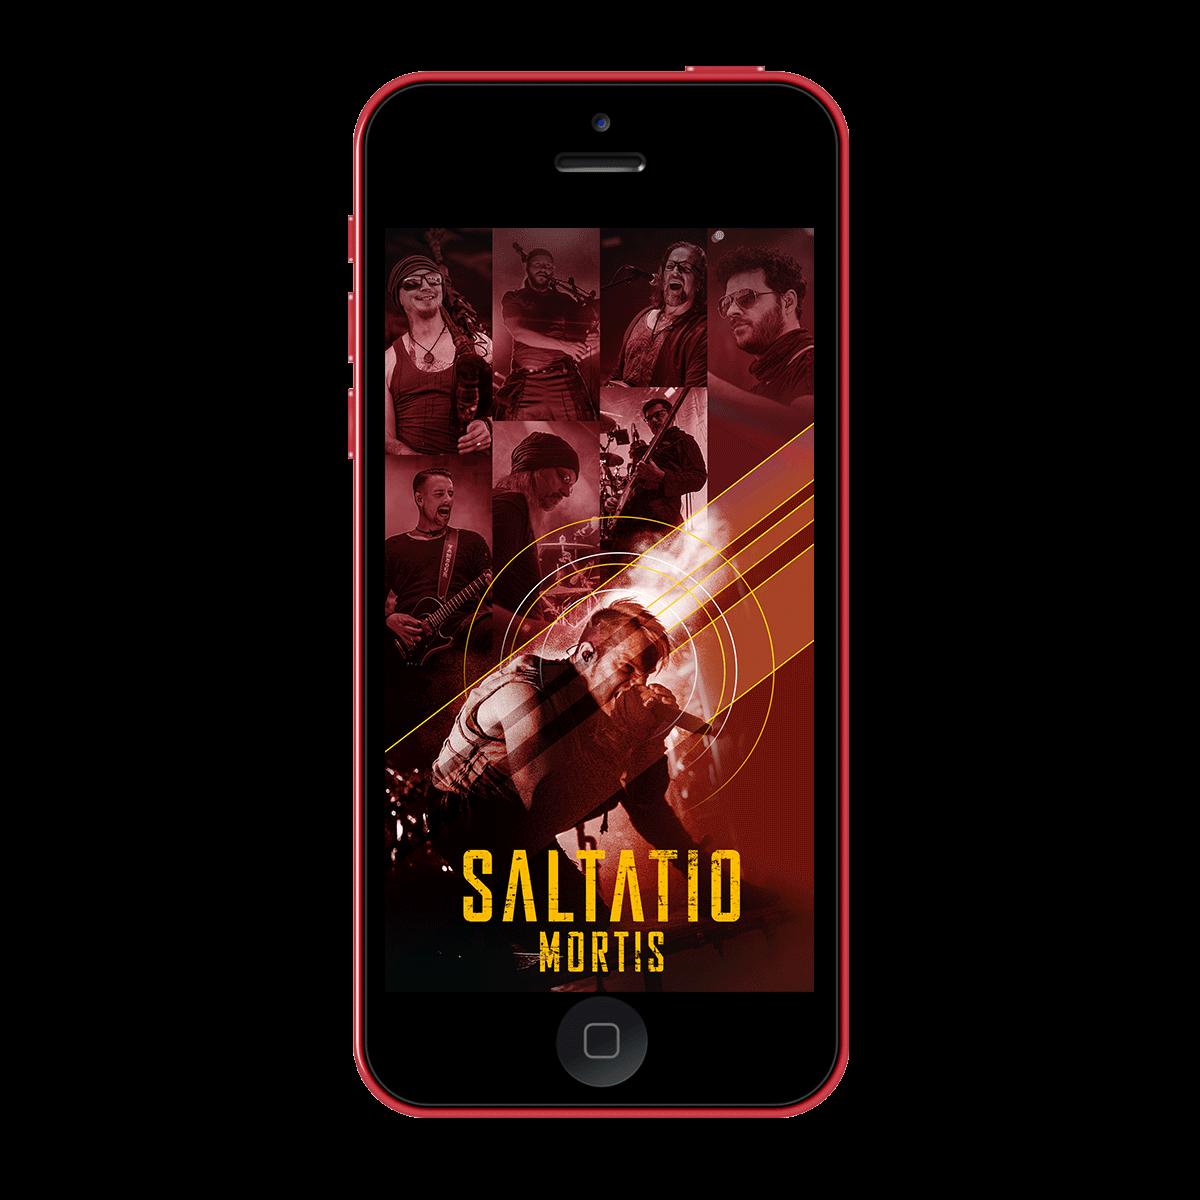 Saltatio mortis discography download